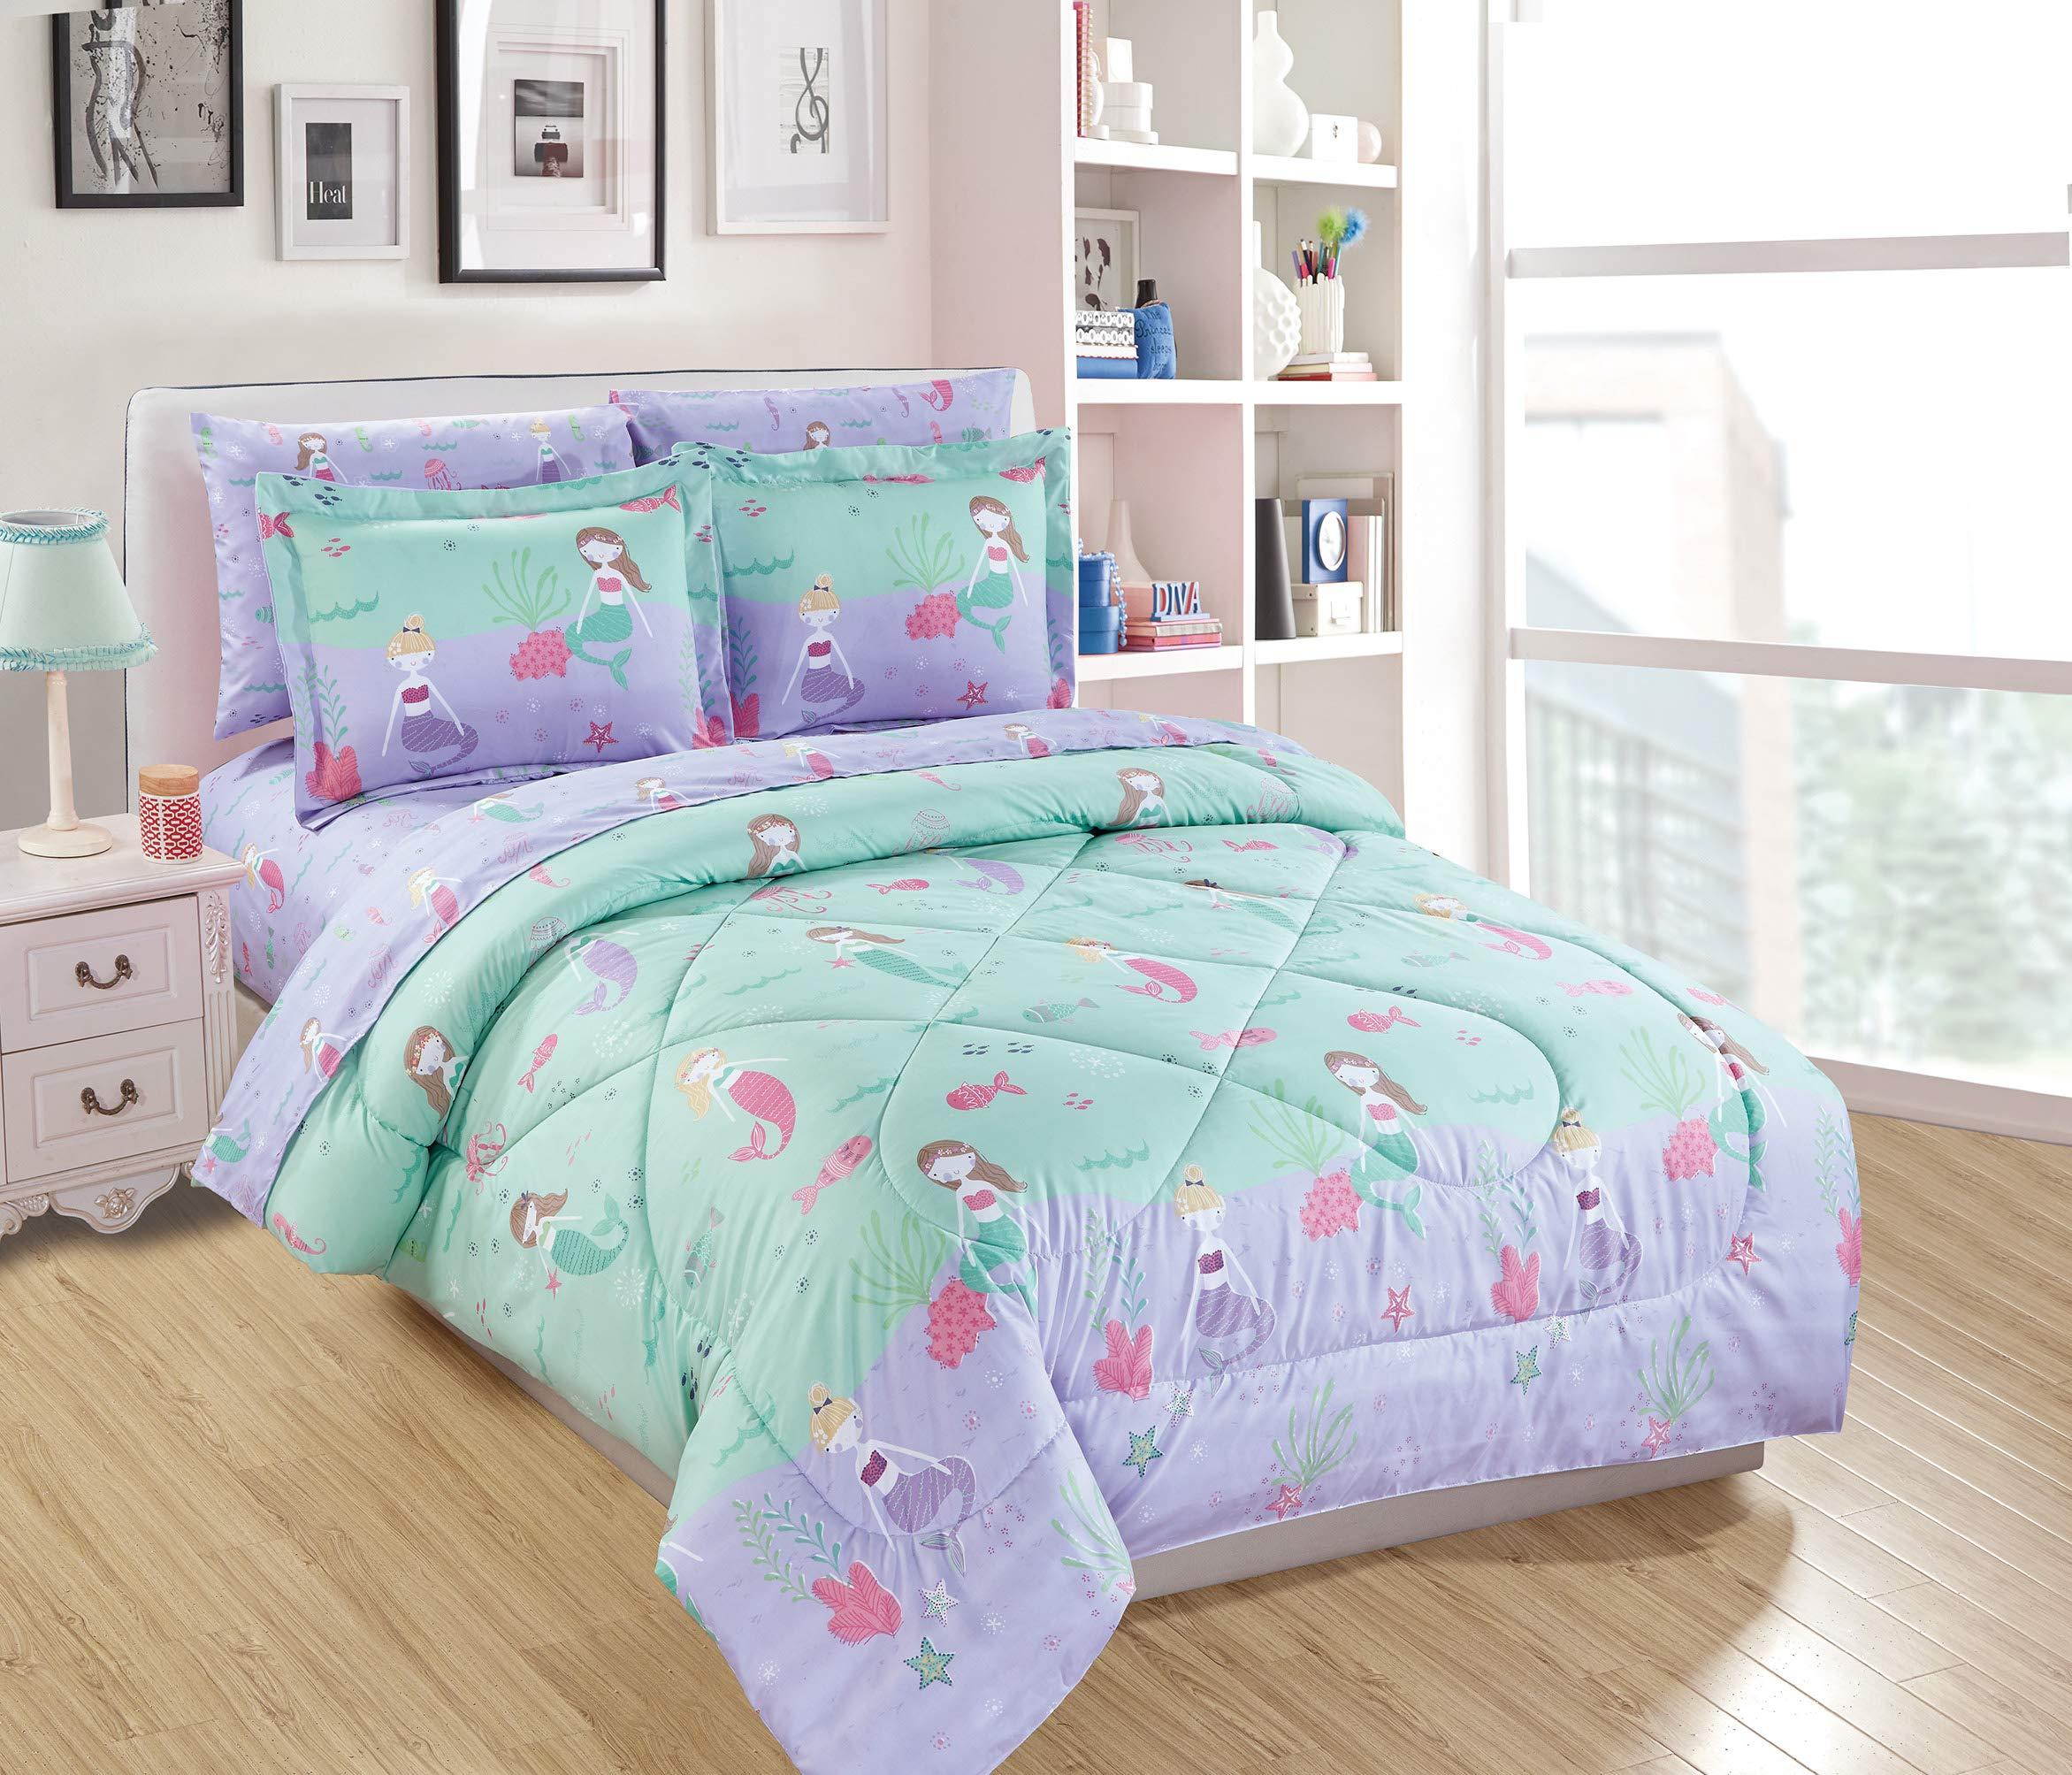 Twin Size 5pc Comforter Set Girls/Teens Mermaids Starfishes Jellyfishes Lavender Pink Aqua New